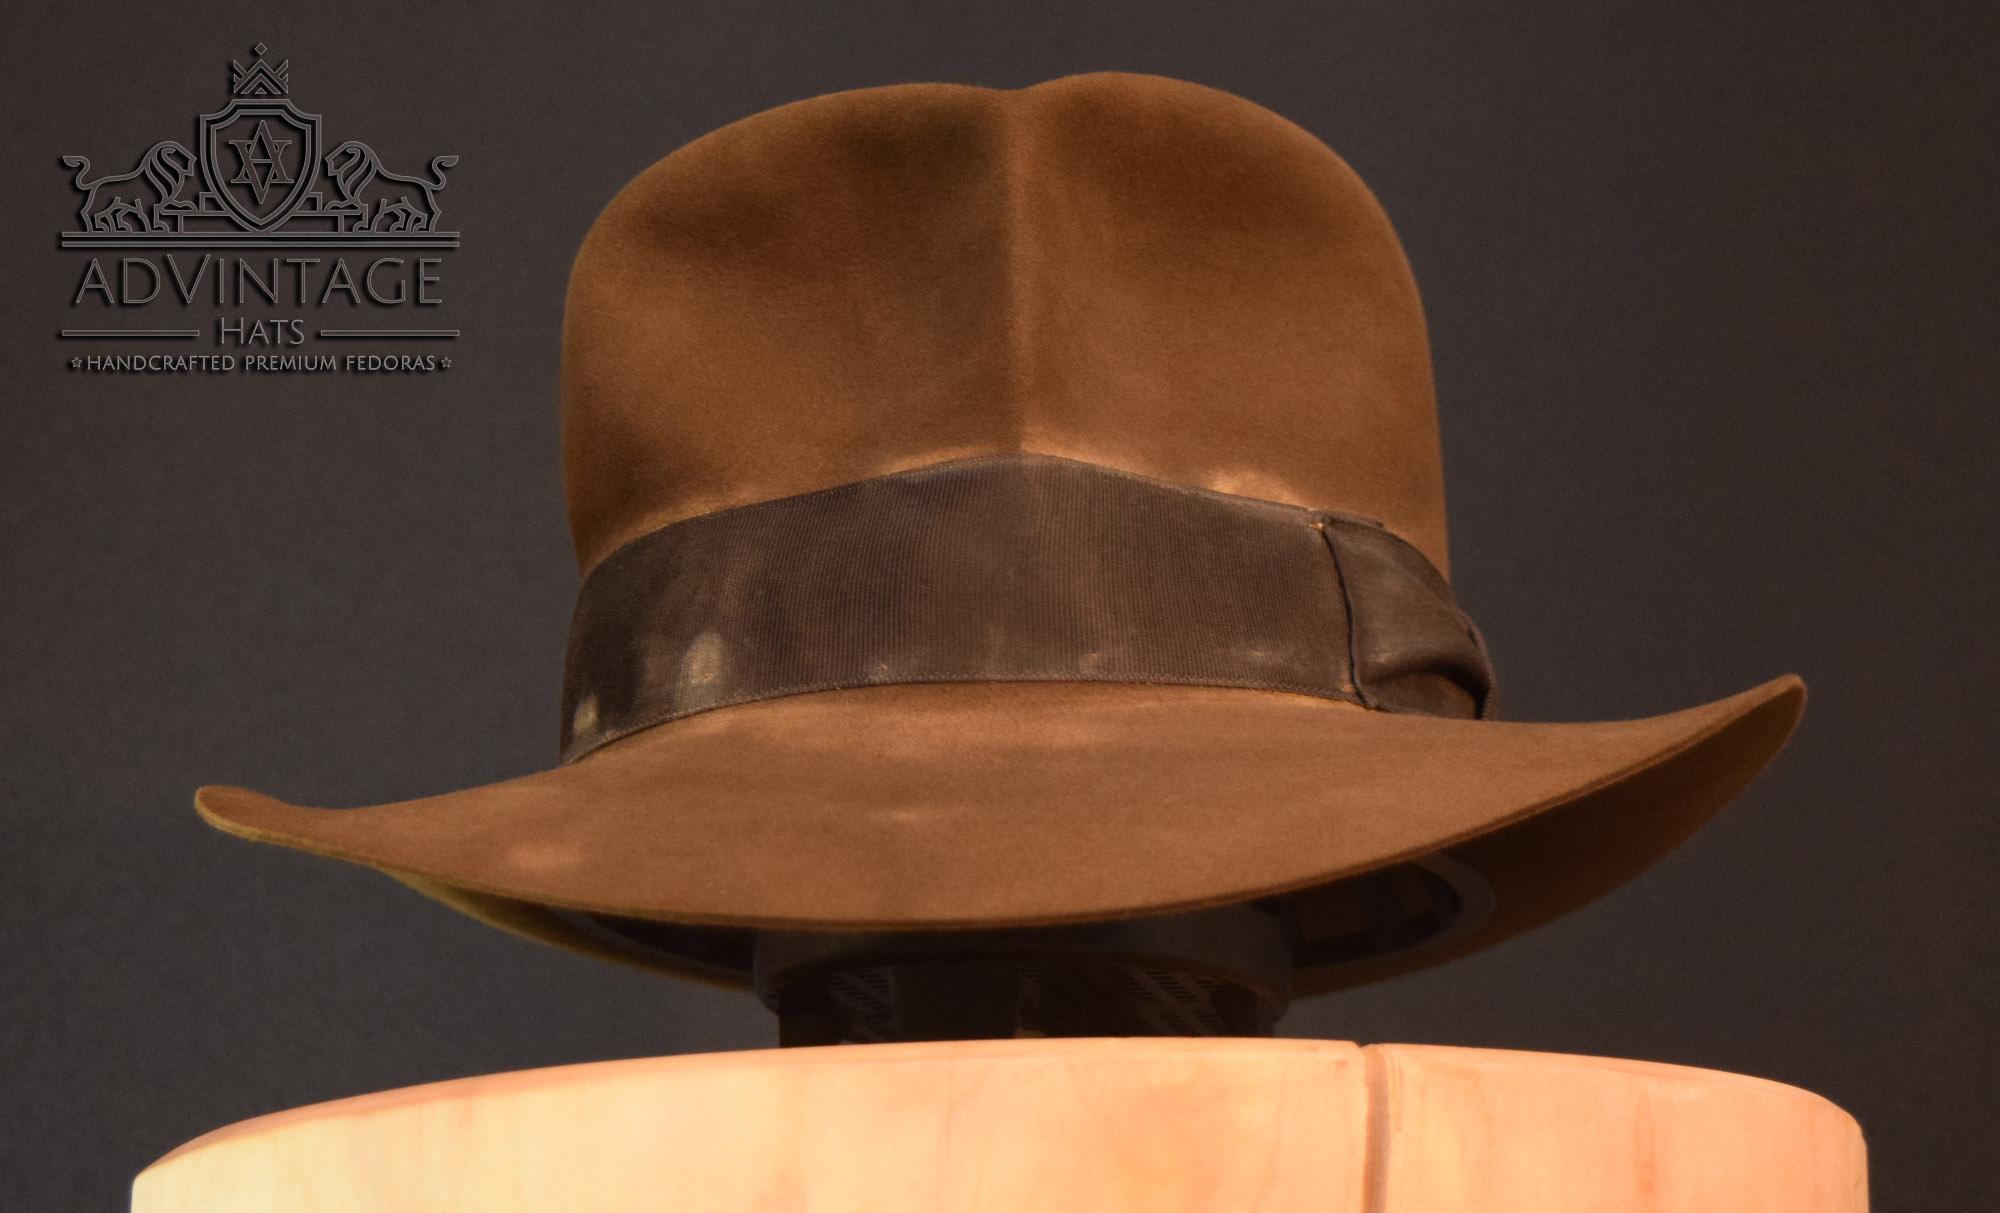 Shorter Streets of Cairo Fedora Hut hat in raiders-sable indy indana jones